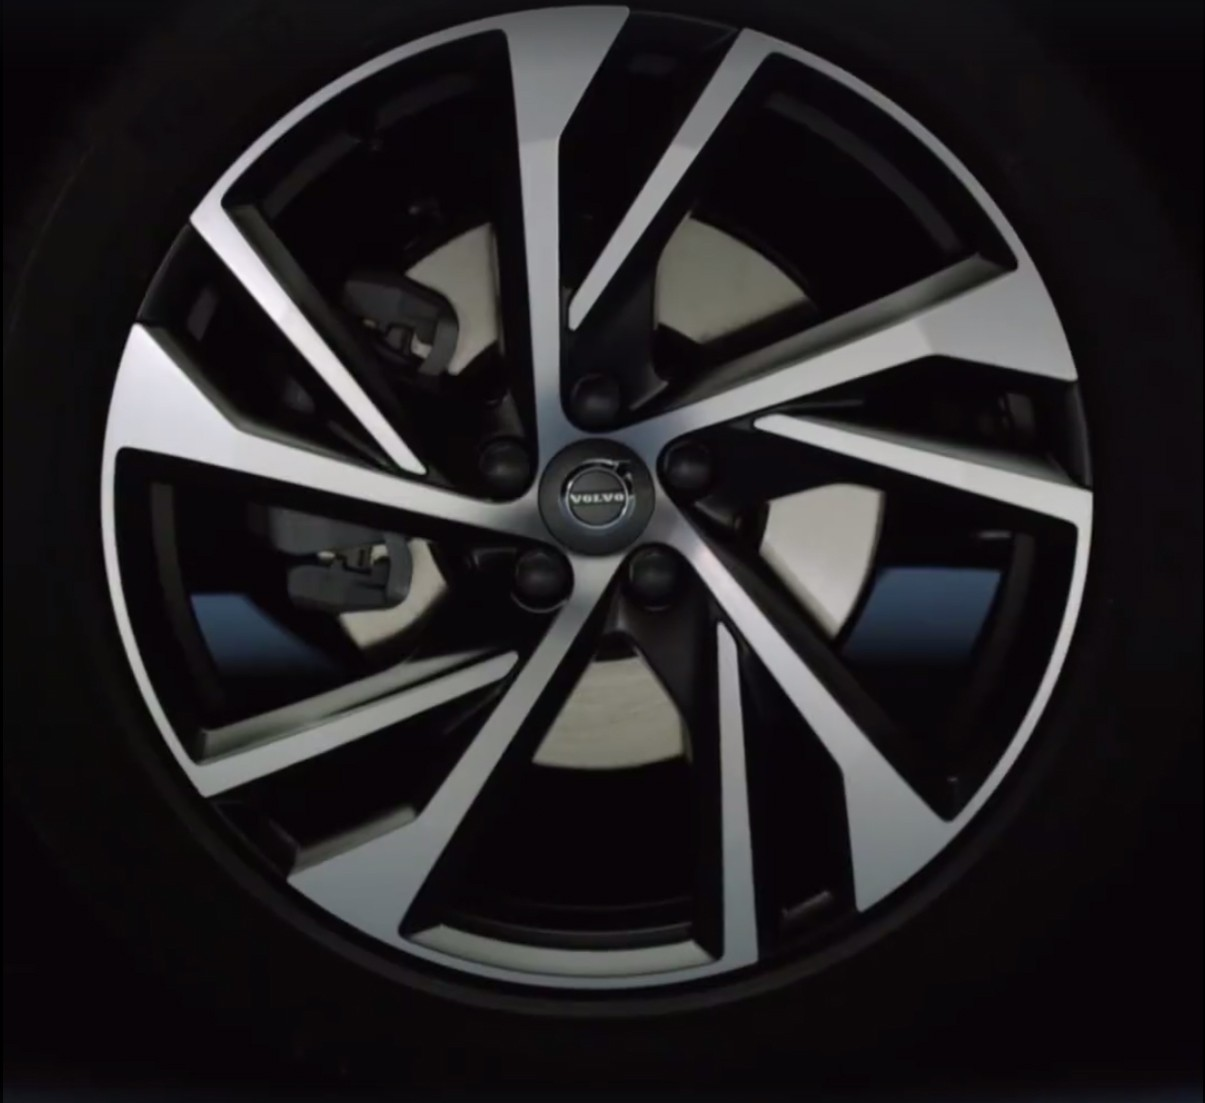 2018 Volvo Xc40 Leaked Online T5 Hybrid Confirmed